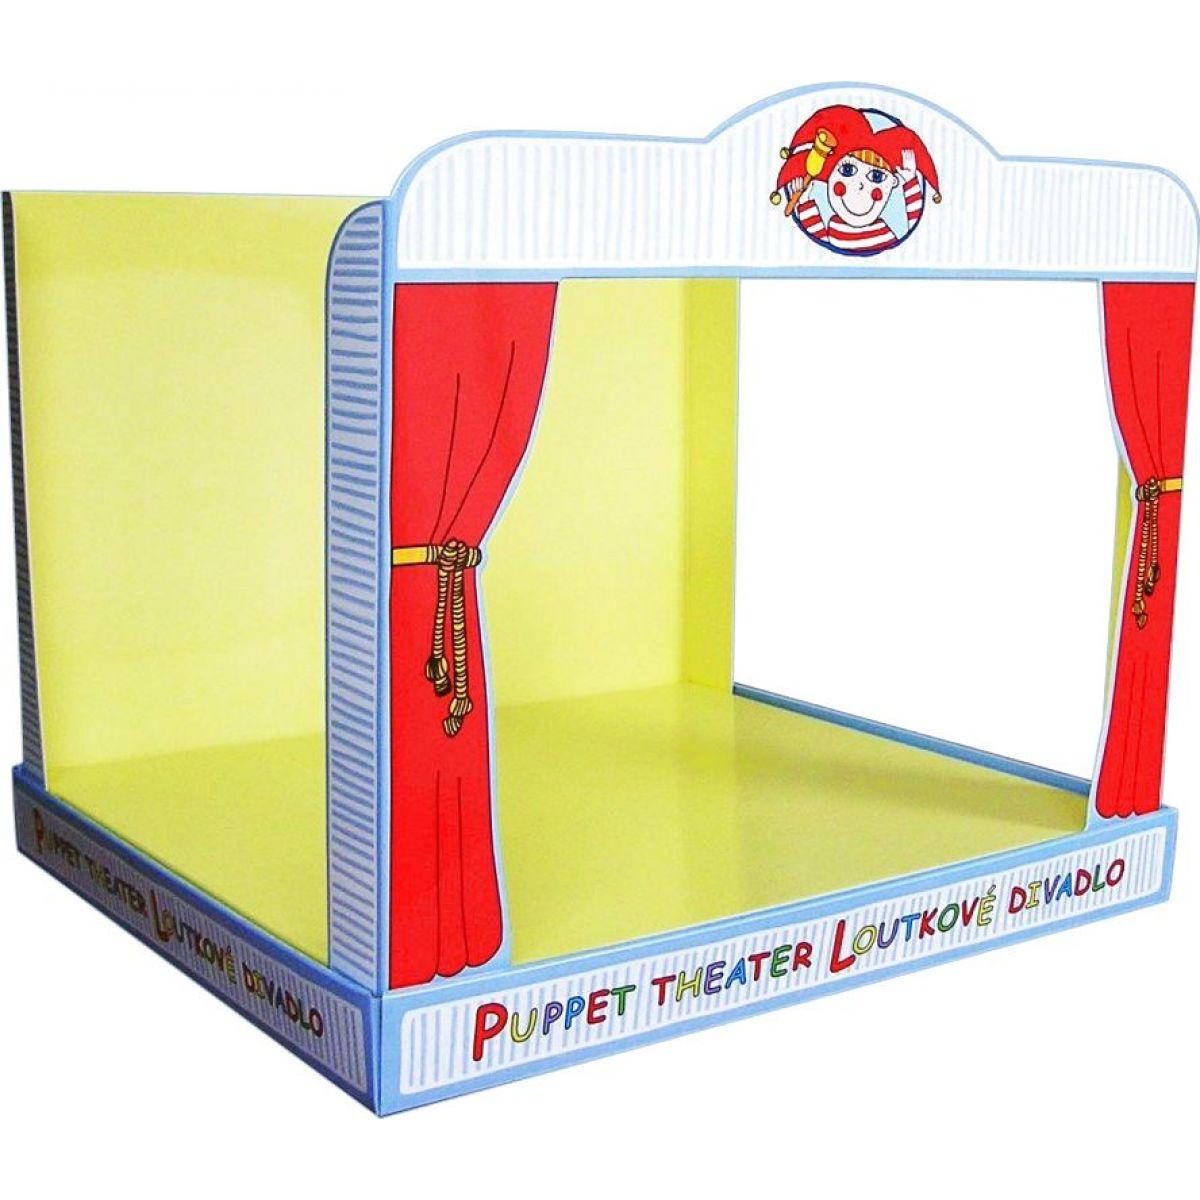 Marionetino Loutkové divadlo Prázdné